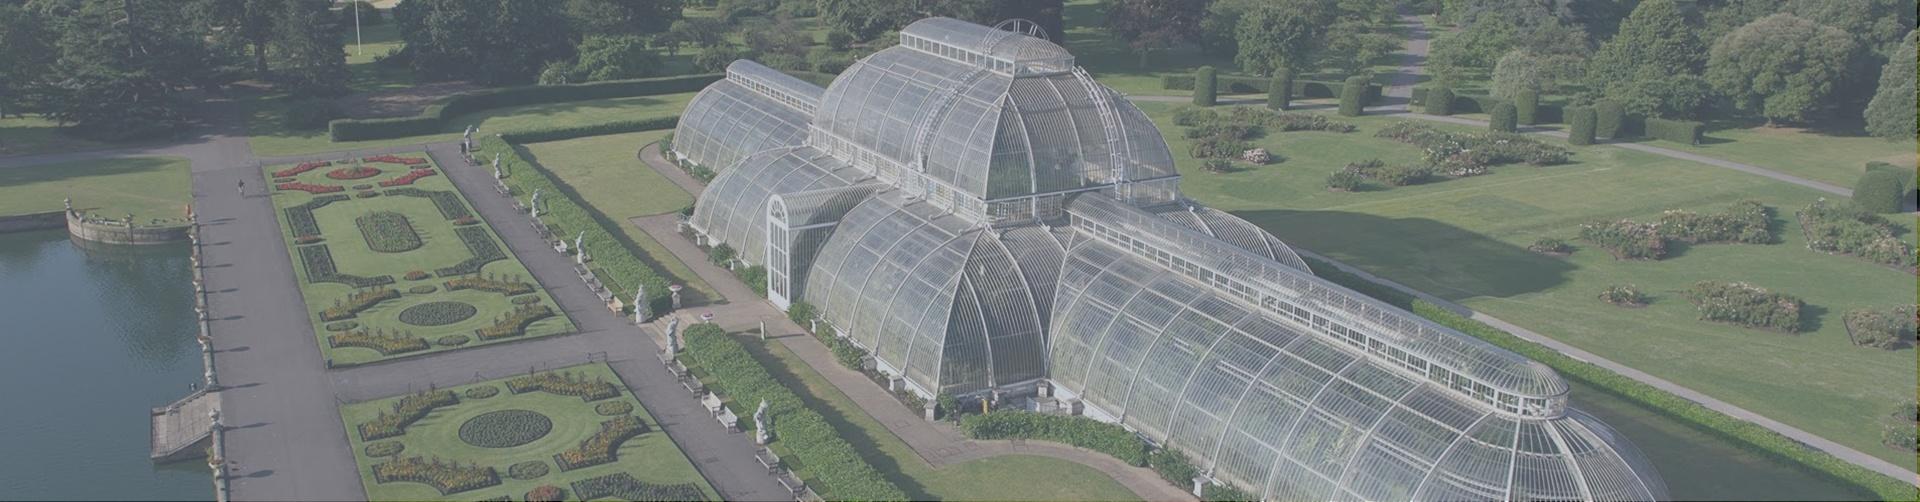 Kew Banner.jpg